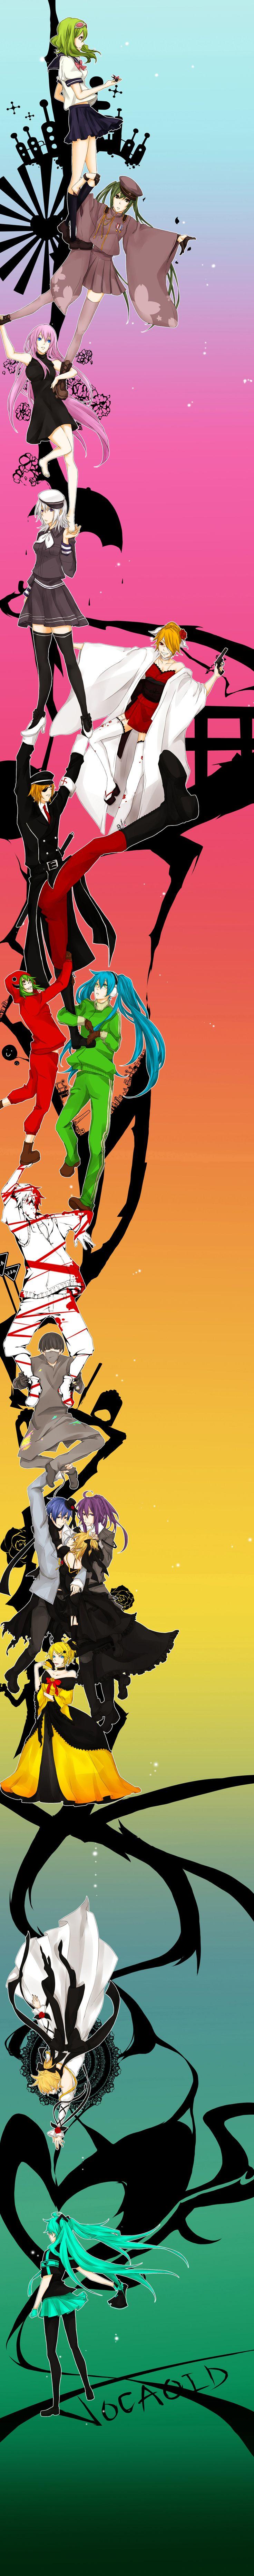 Tags: Hatsune Miku, Kagamine Rin, Kagamine Len, KAITO, Megurine Luka, Kamui Gakupo, Love is War, Story of Evil, GUMI, Pixiv, Imitation Black, Trust Me, Matryoshka, Song-Over, Karakuri 卍 Burst, Leia, Fan Character, Ama no Jaku, VanaN'Ice, Hachi-p, Time-warped After Chopping My Stag Beetle, Senbon Sakura, Akuno-p, The Lost Memory, Scl Project, Natsu-p, akinashi., Kagerou Project